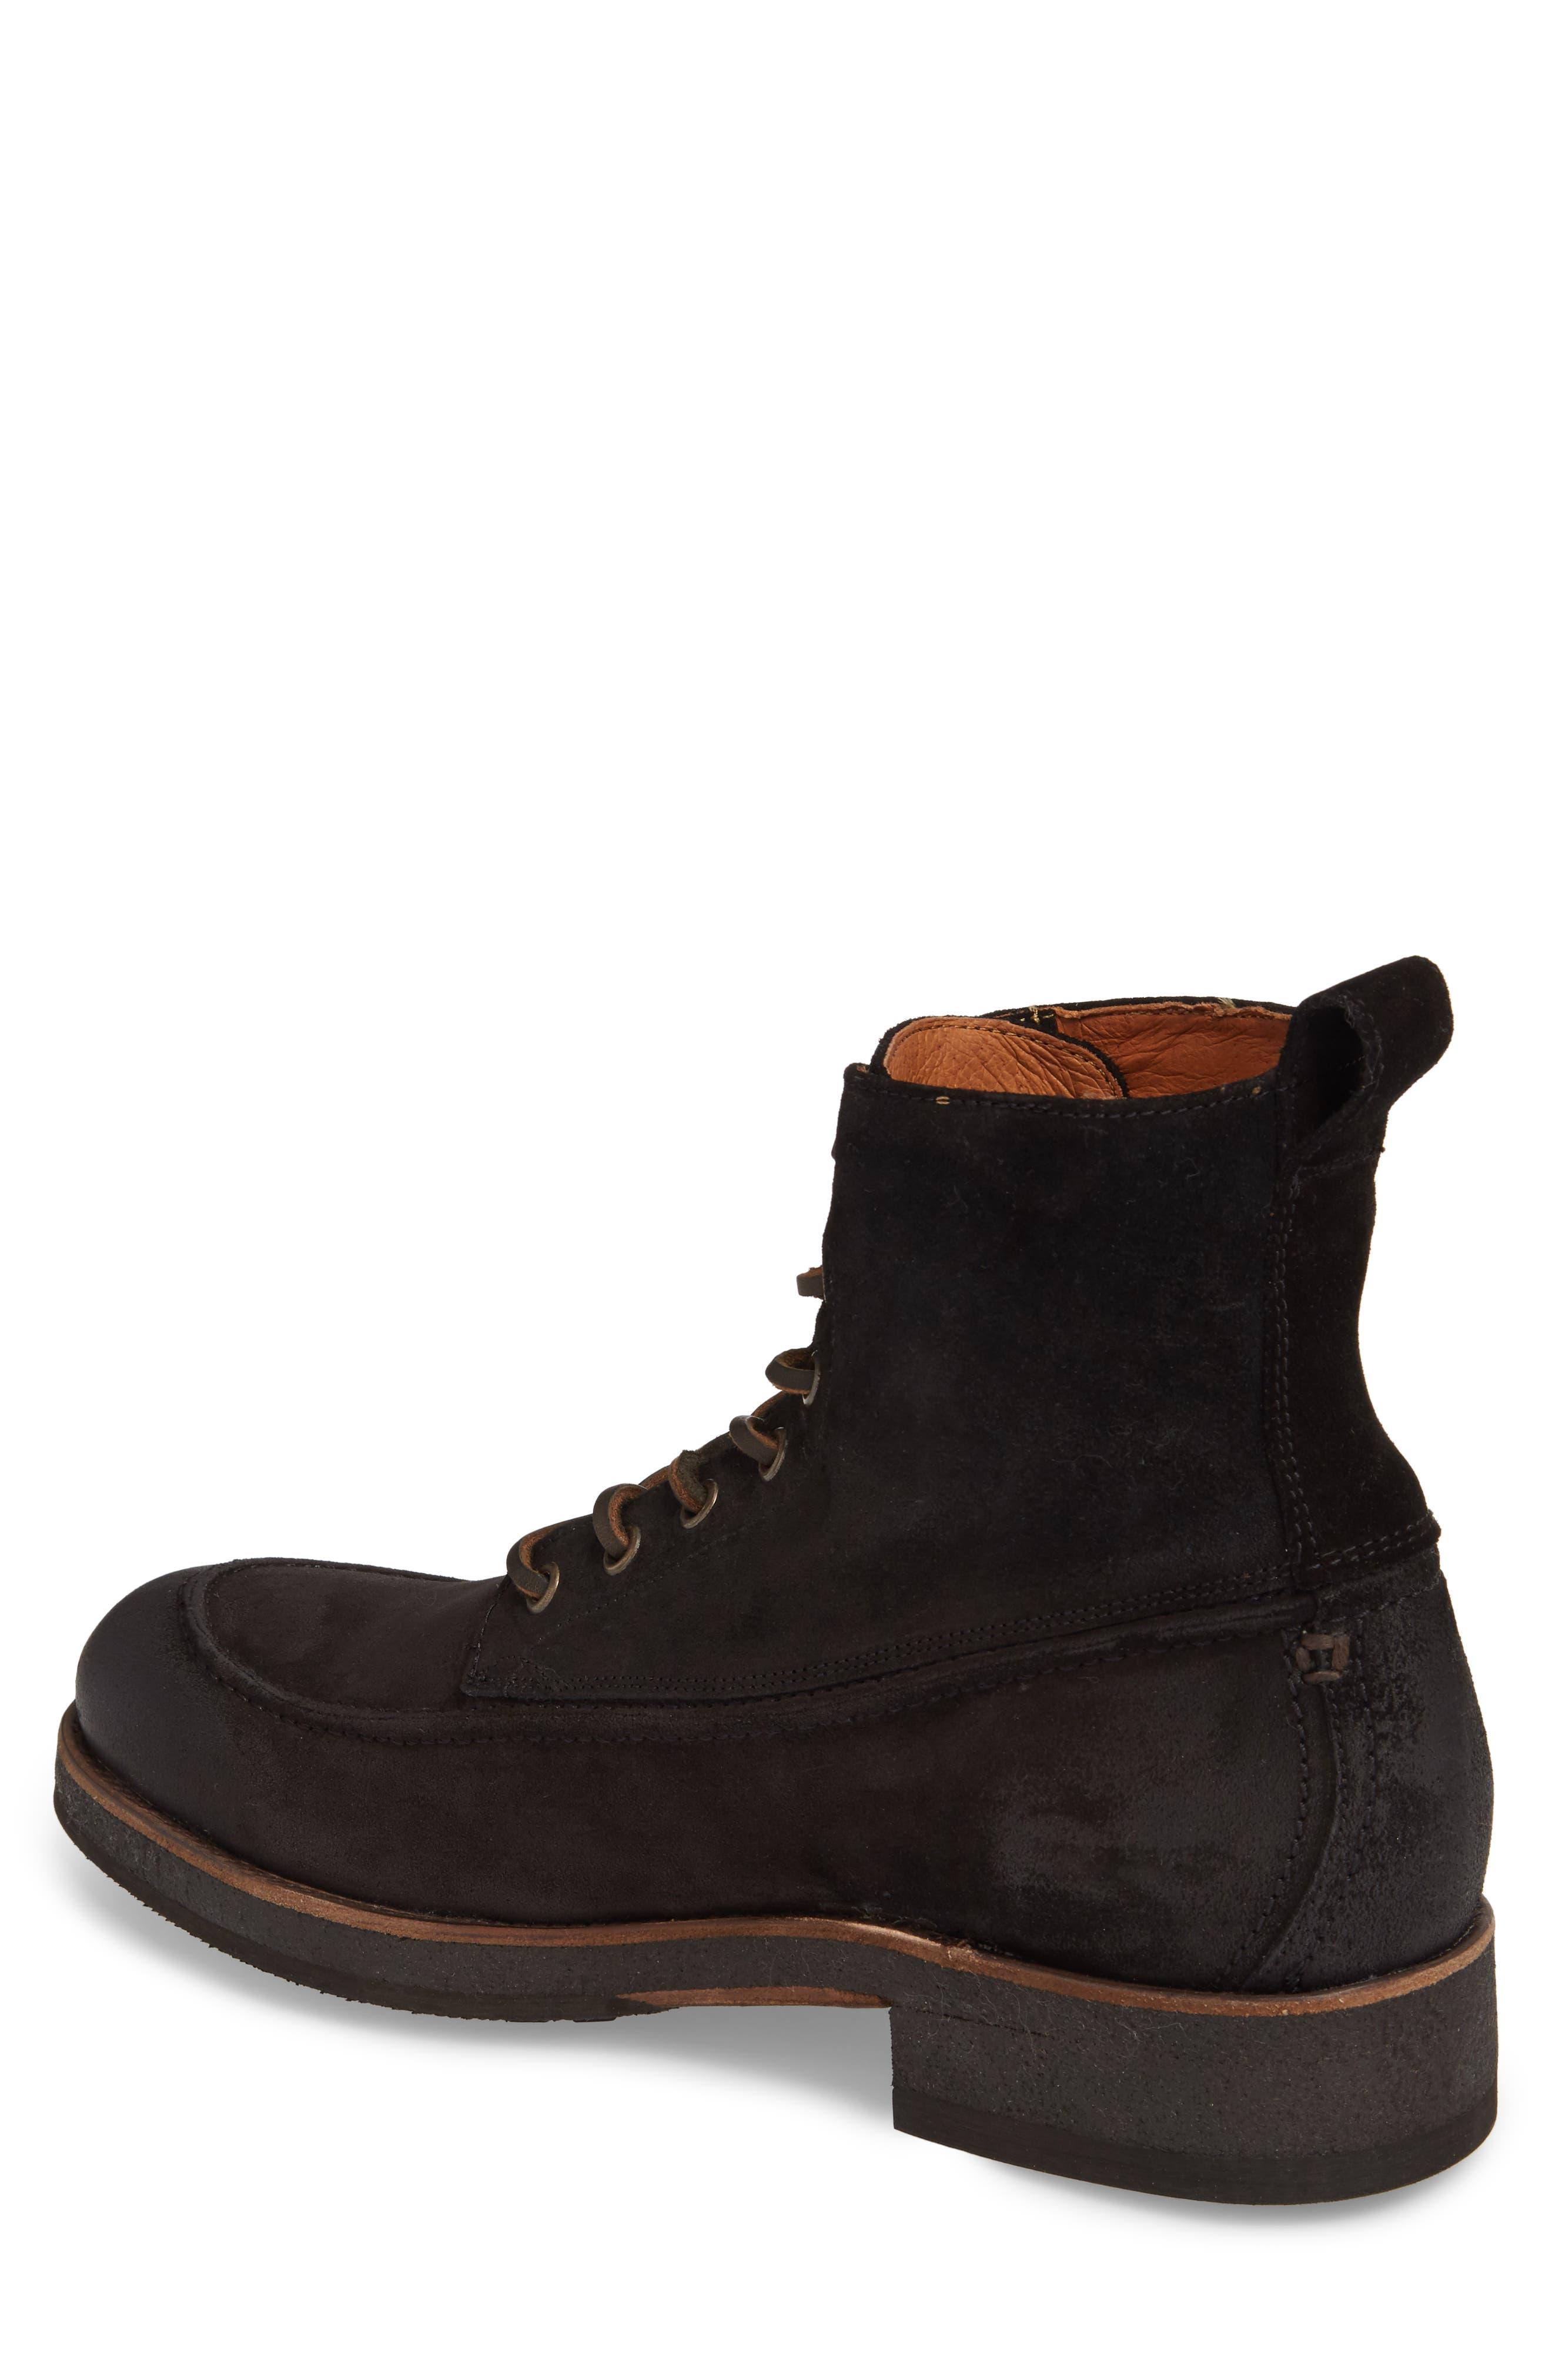 Alternate Image 2  - Frye Rainier Waxed Work Boot (Men)